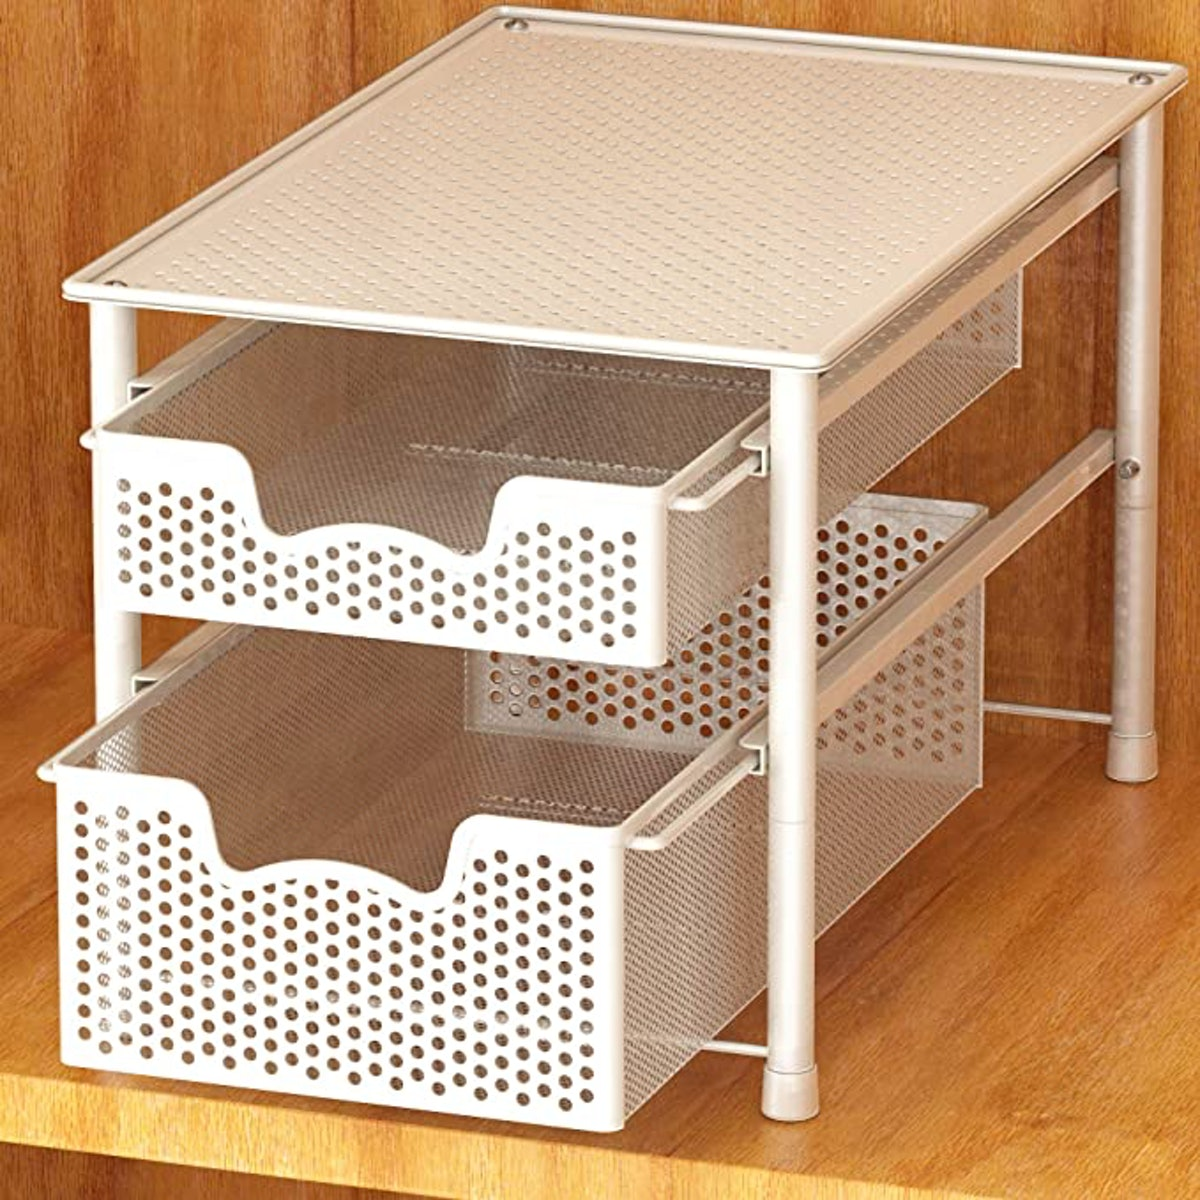 Simple Houseware Stackable 2-Tier Sliding Basket Organizer Drawer